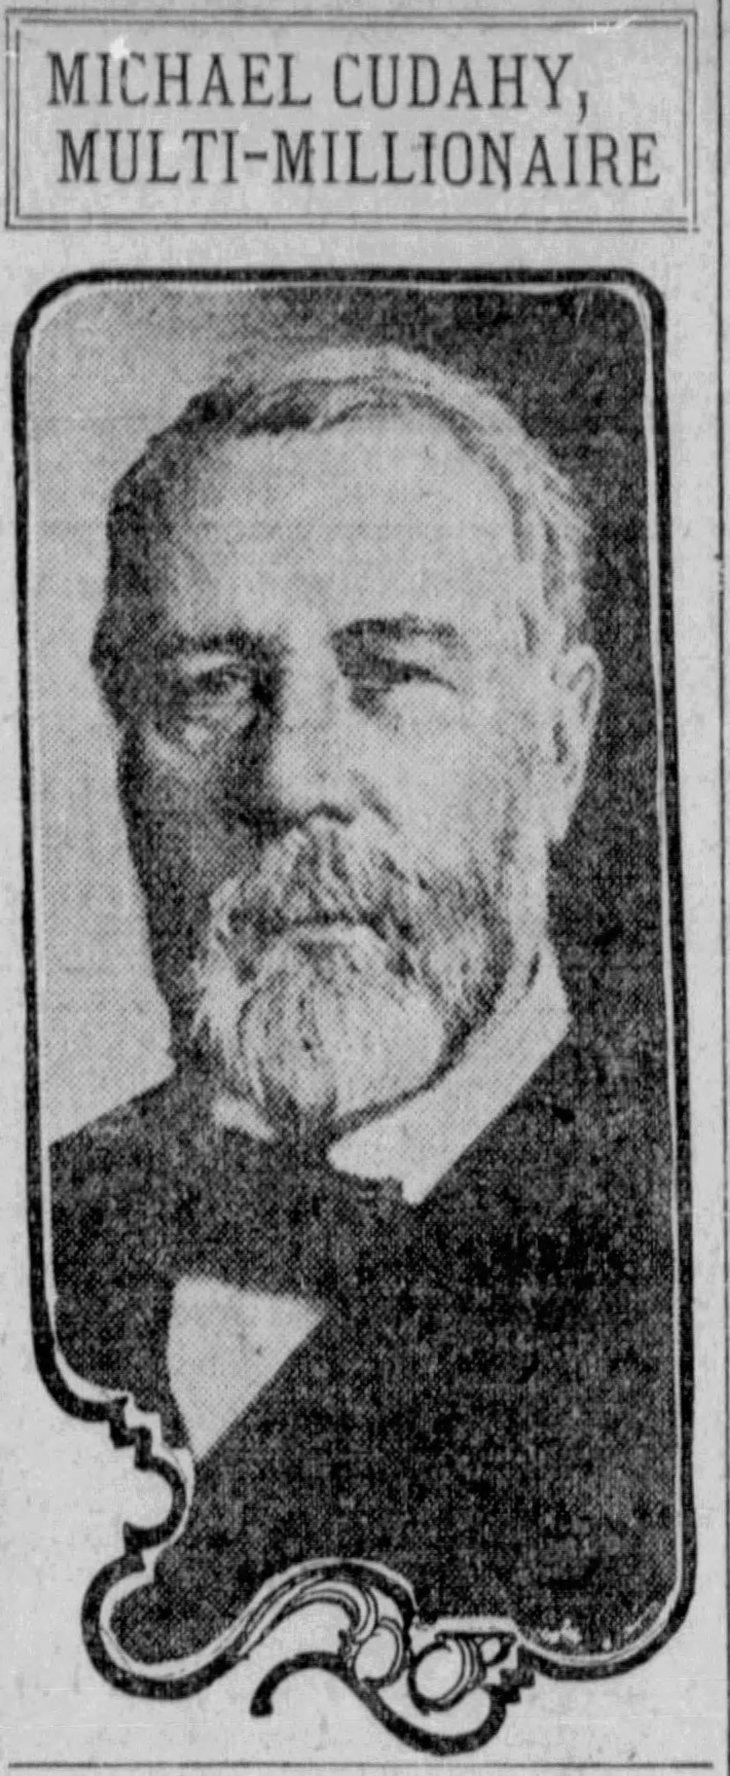 Cudahy photo SF_Examiner_Nov_28__1910_